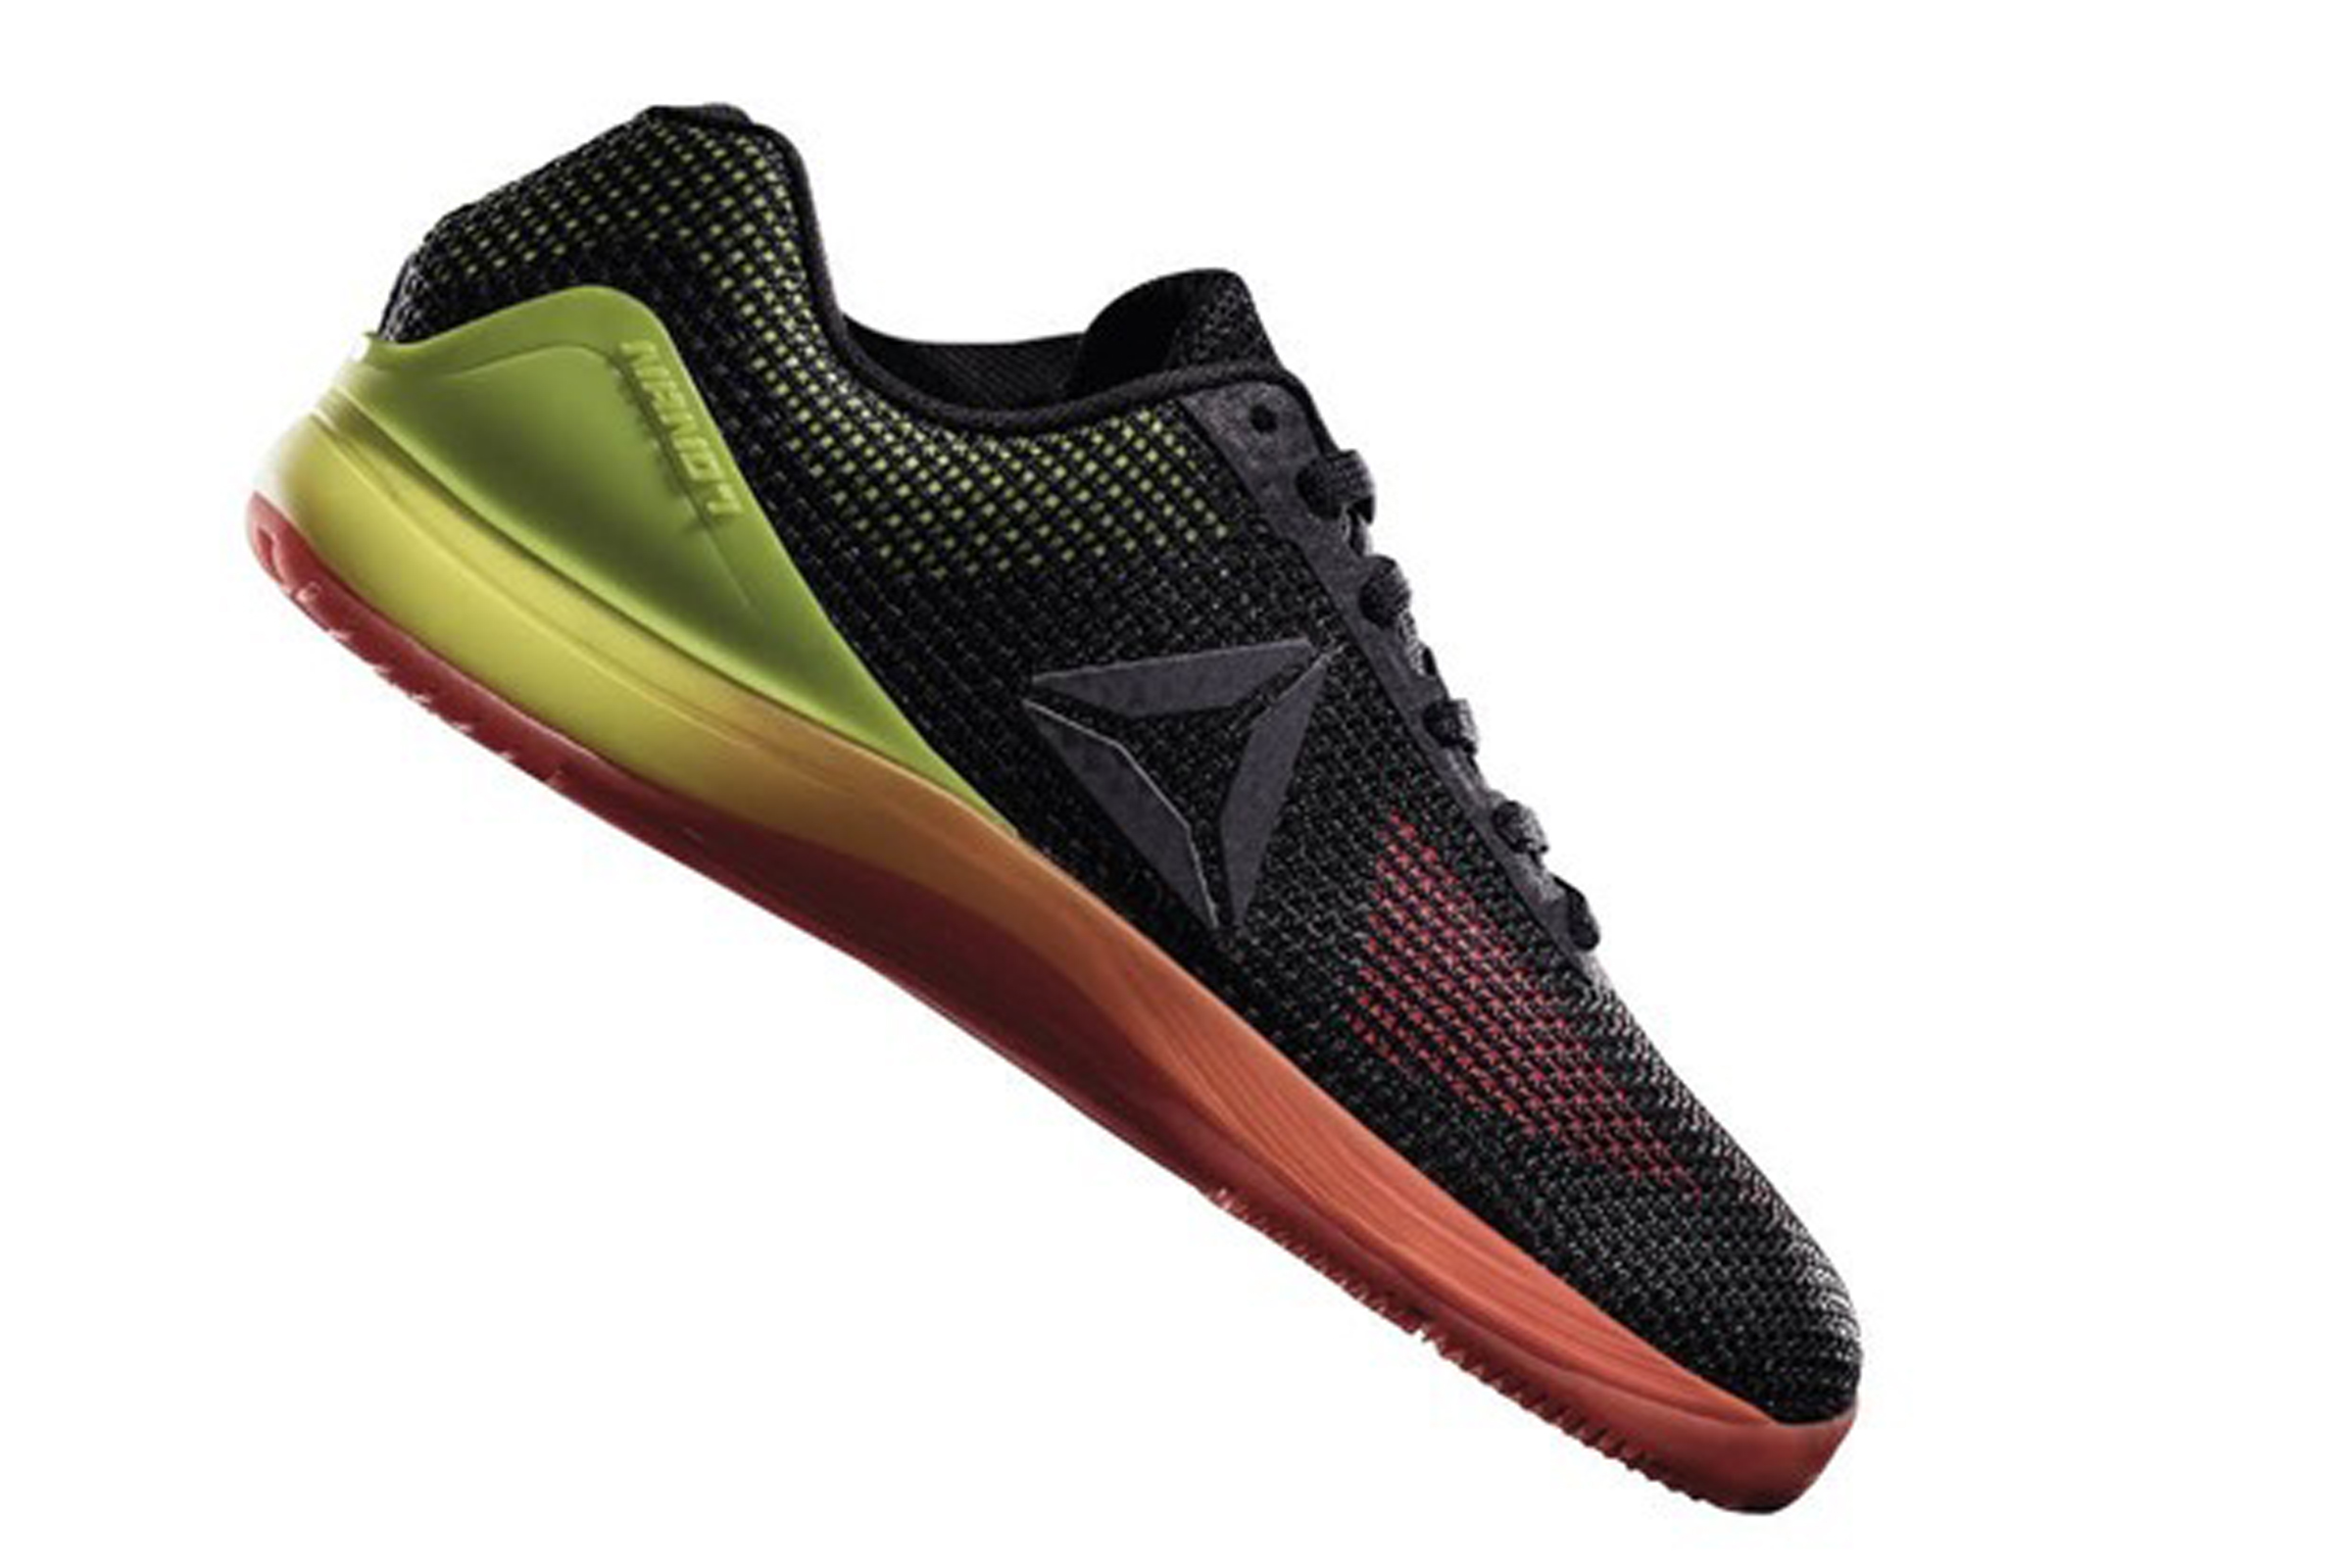 New Kit: Reebok Nano 7 trainers